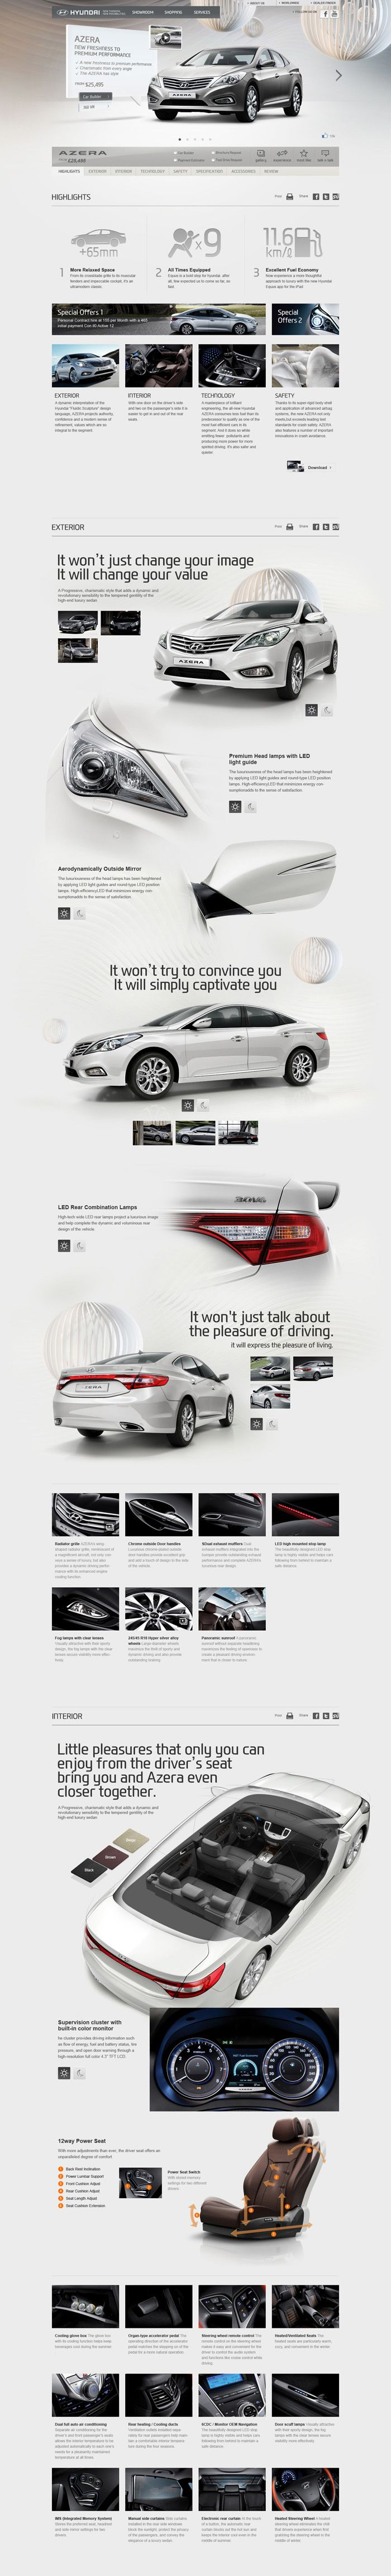 Cool Automotive Web Design on the Internet. Hyundai. #automotive #webdesign @ http://www.pinterest.com/alfredchong/automotive-web-design/